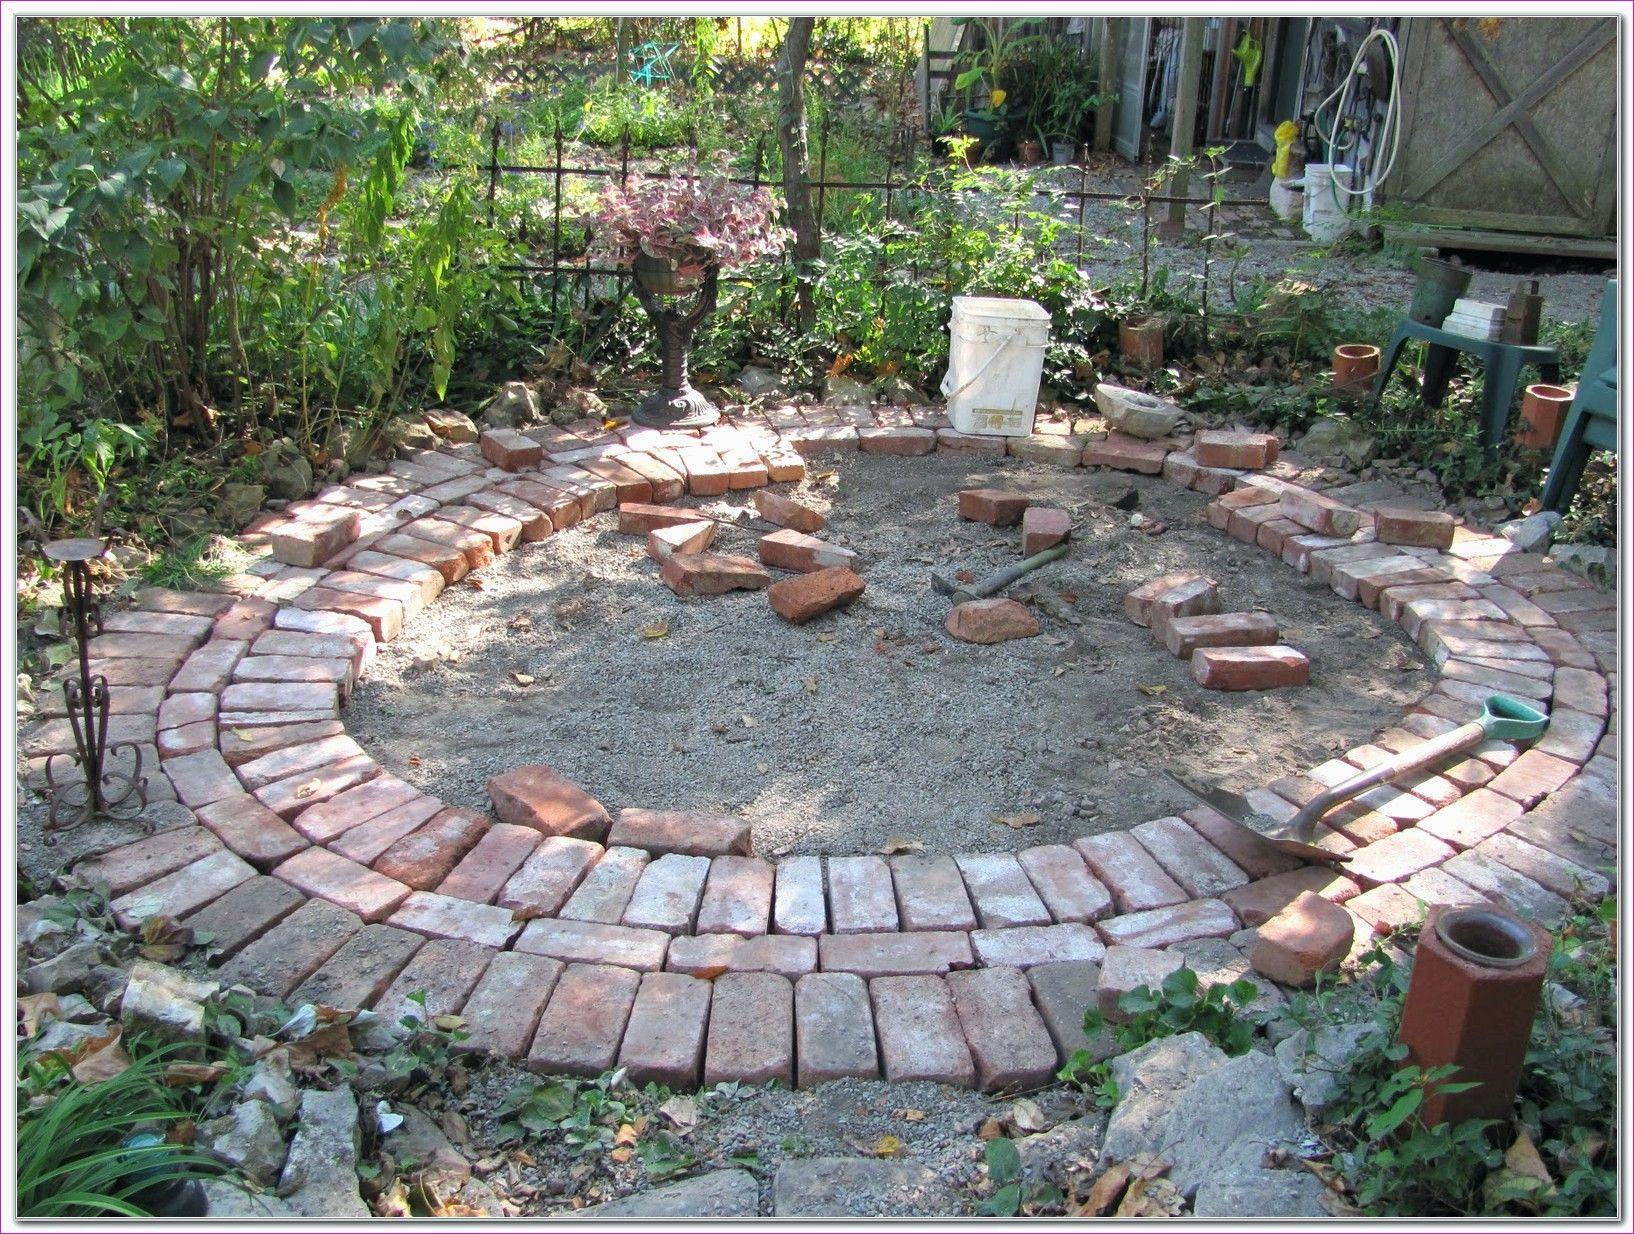 How To Lay Brick Patio Fresh Patio Ideas Patio Brick Laying